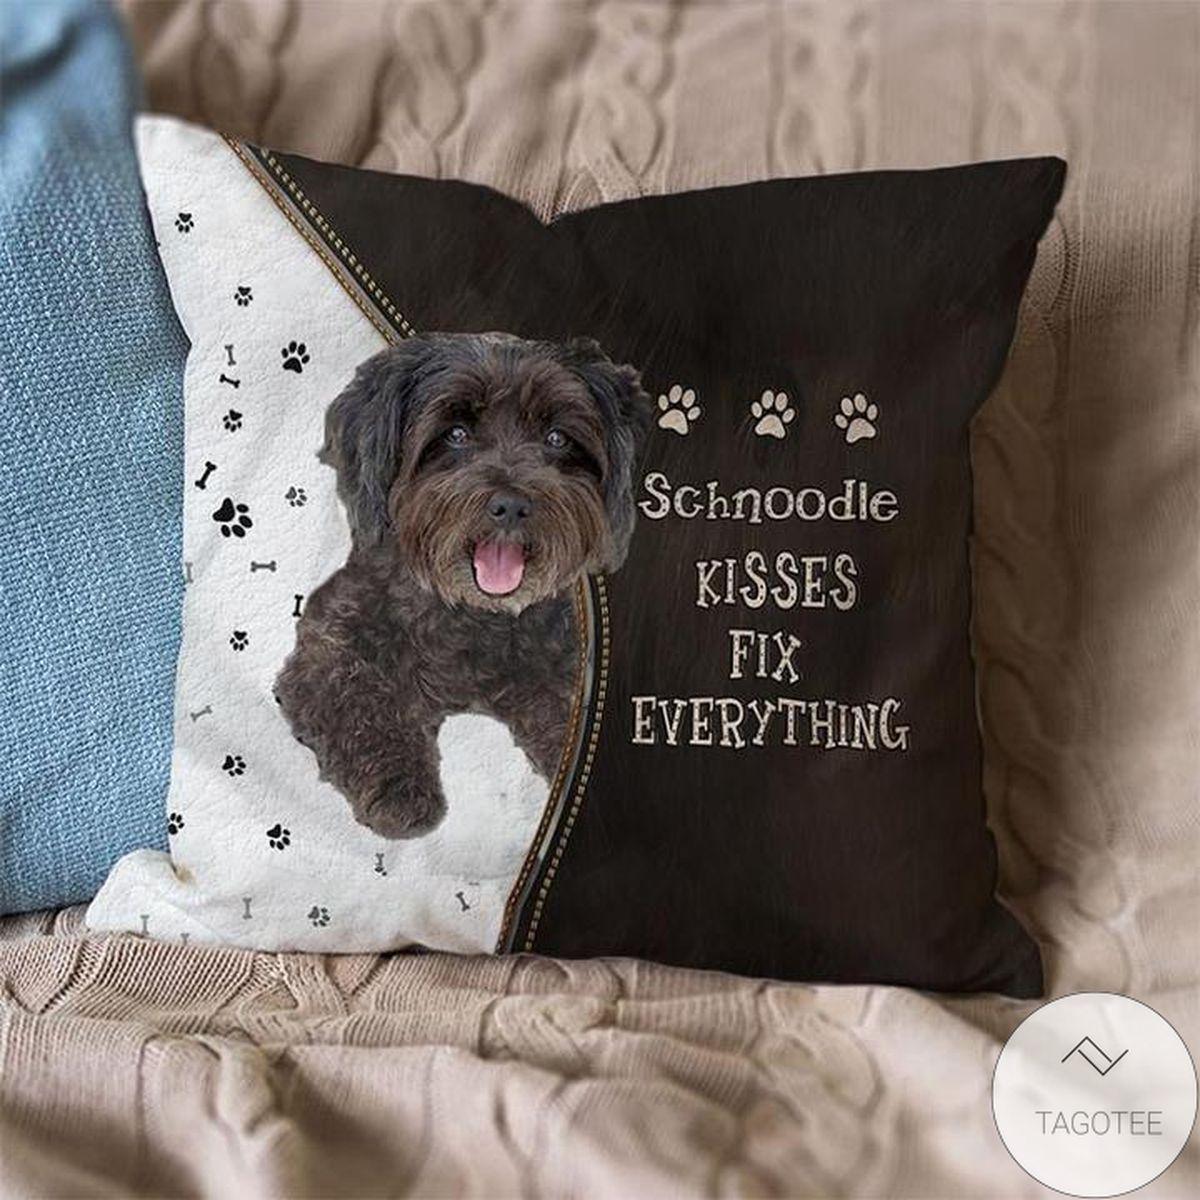 Gorgeous Schnoodle Kisses Fix Everything Pillowcase